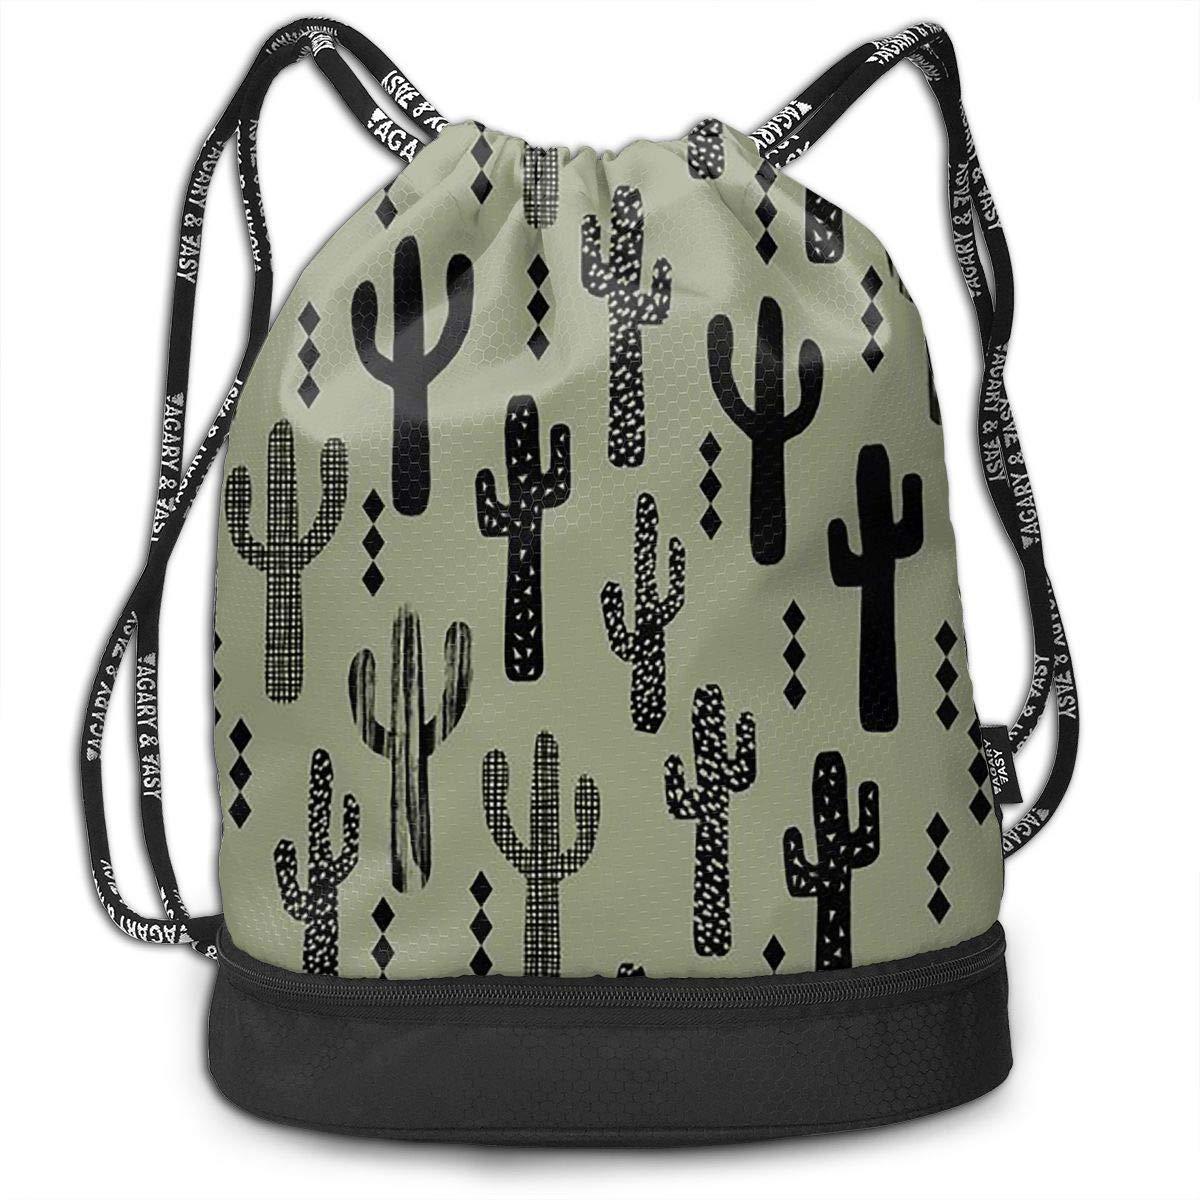 Gymsack Cactus Light Green Print Drawstring Bags Simple Bundle Pocket Backpack Gym Bags Accessories